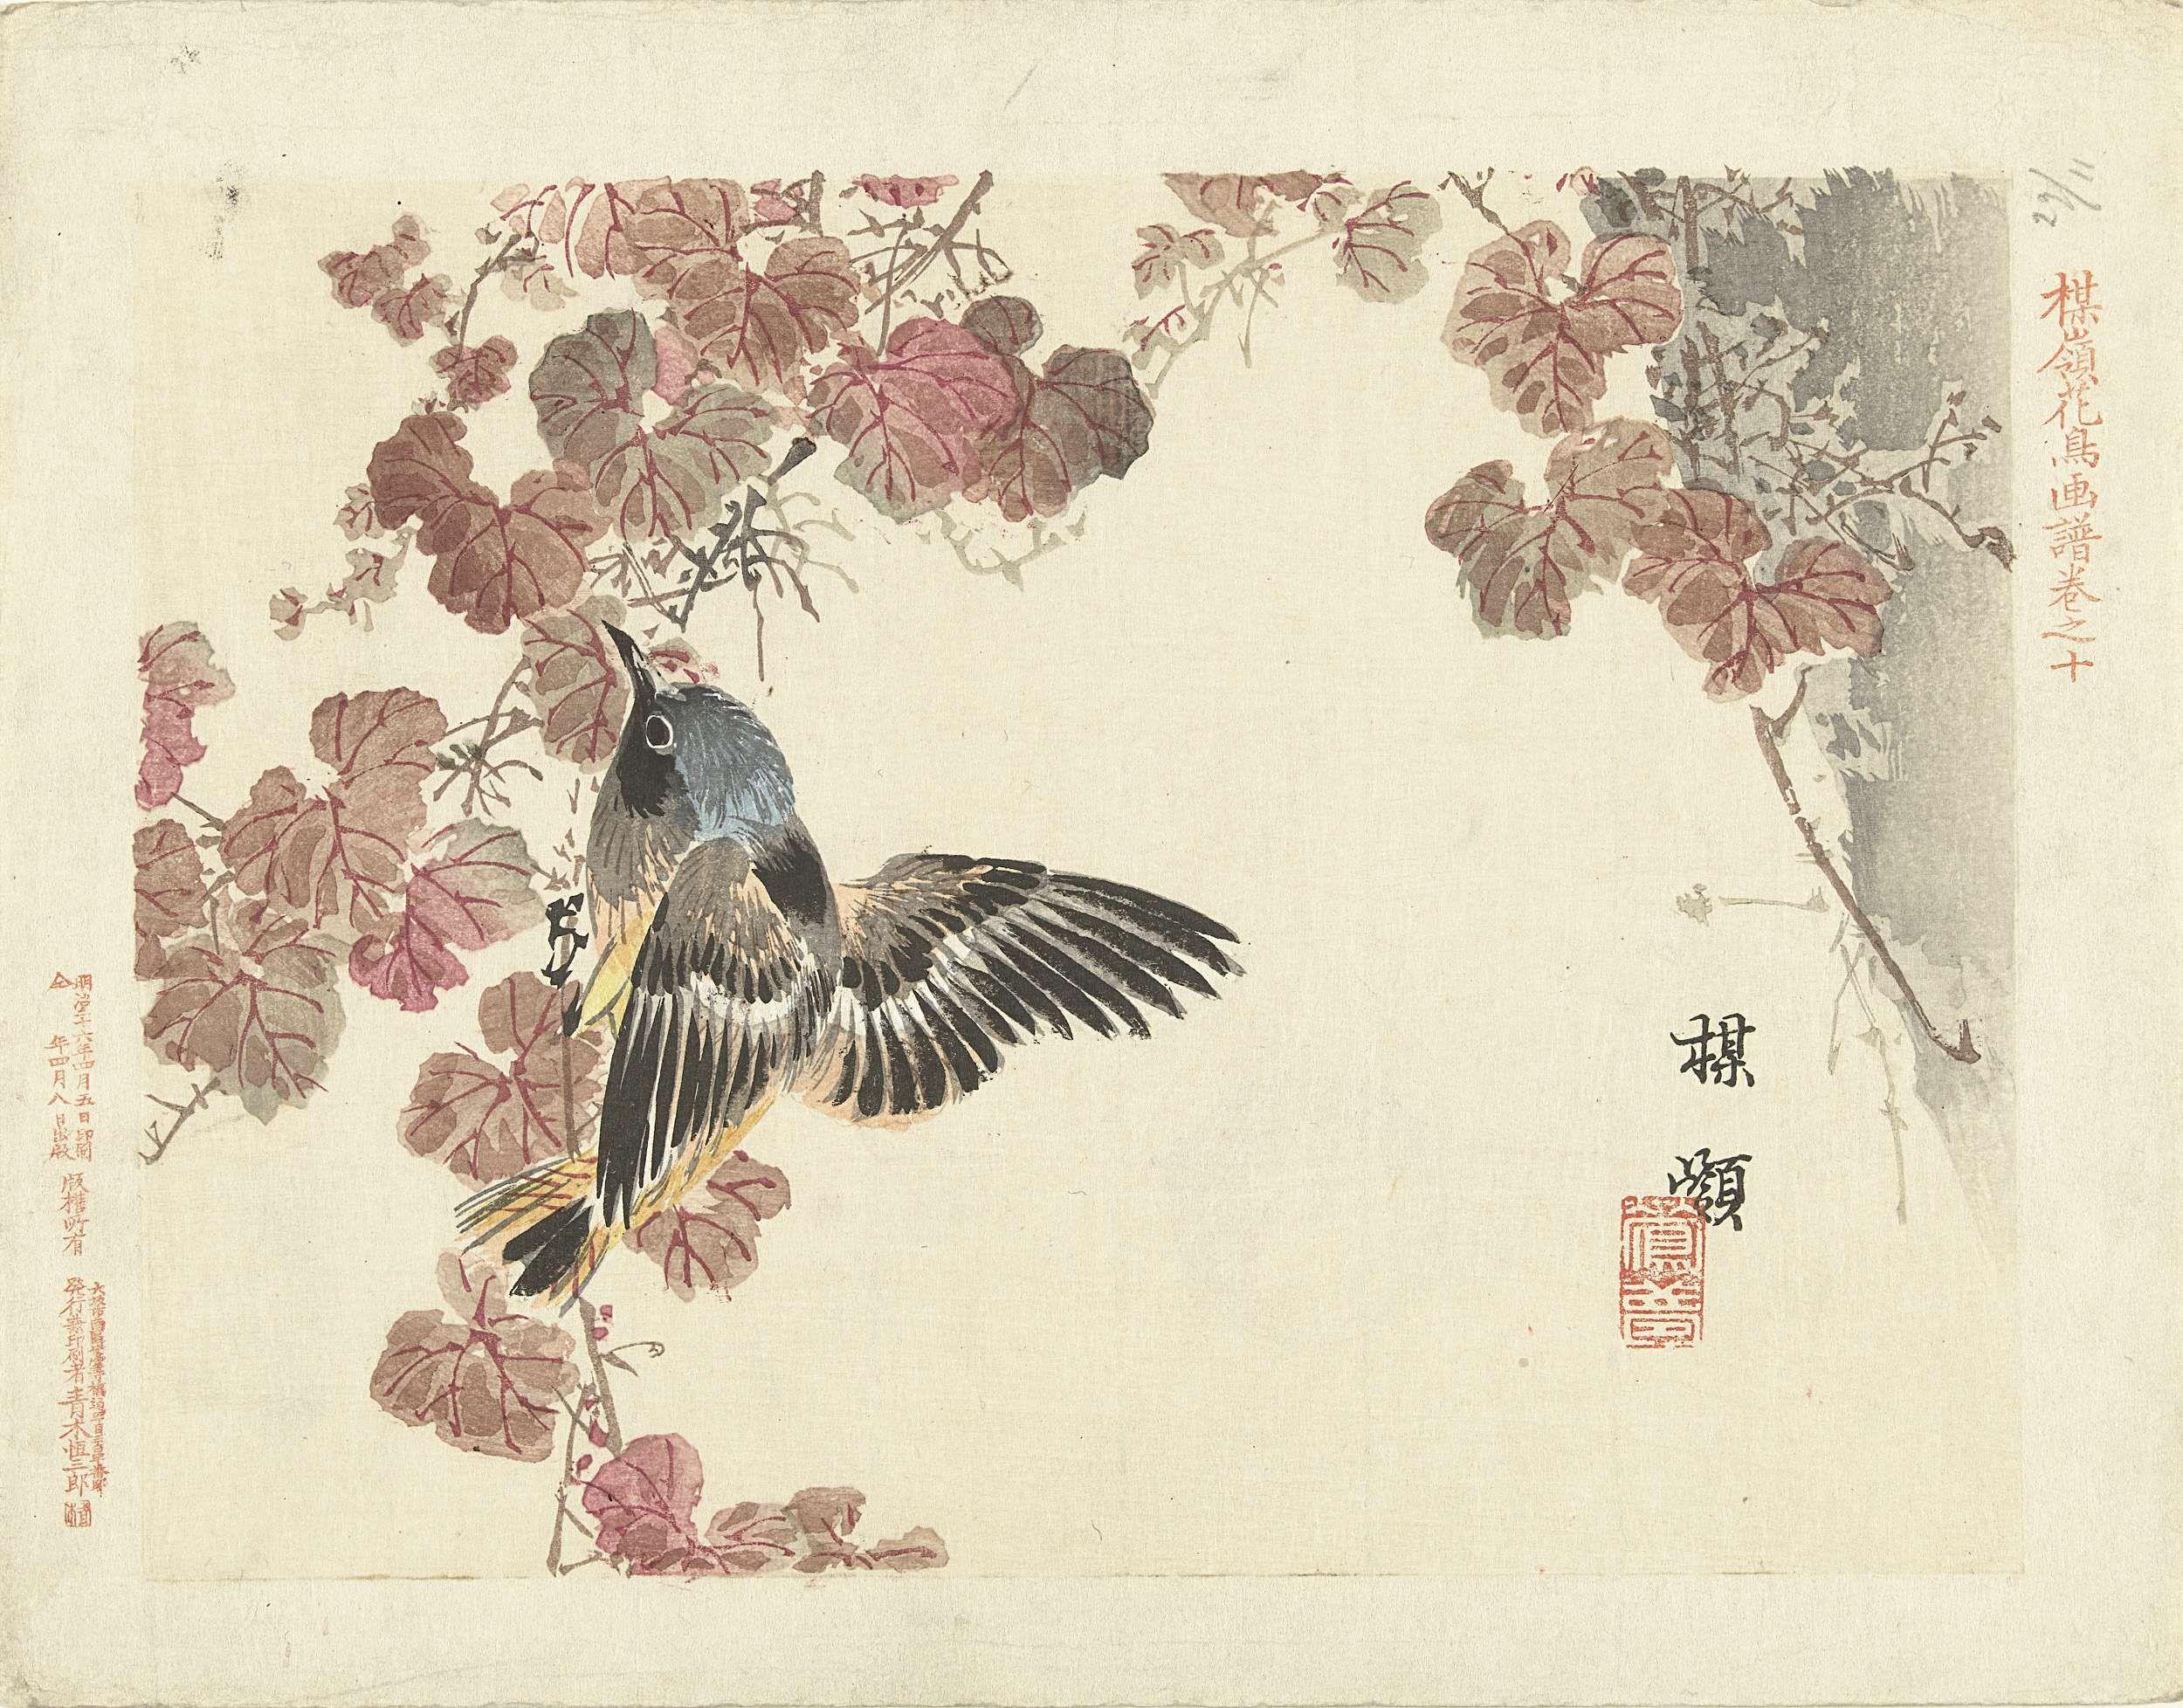 Vogel bij rood blad, Kôno Bairei, Aoki Kôsaburô, Aoki Kôsaburô, 1893